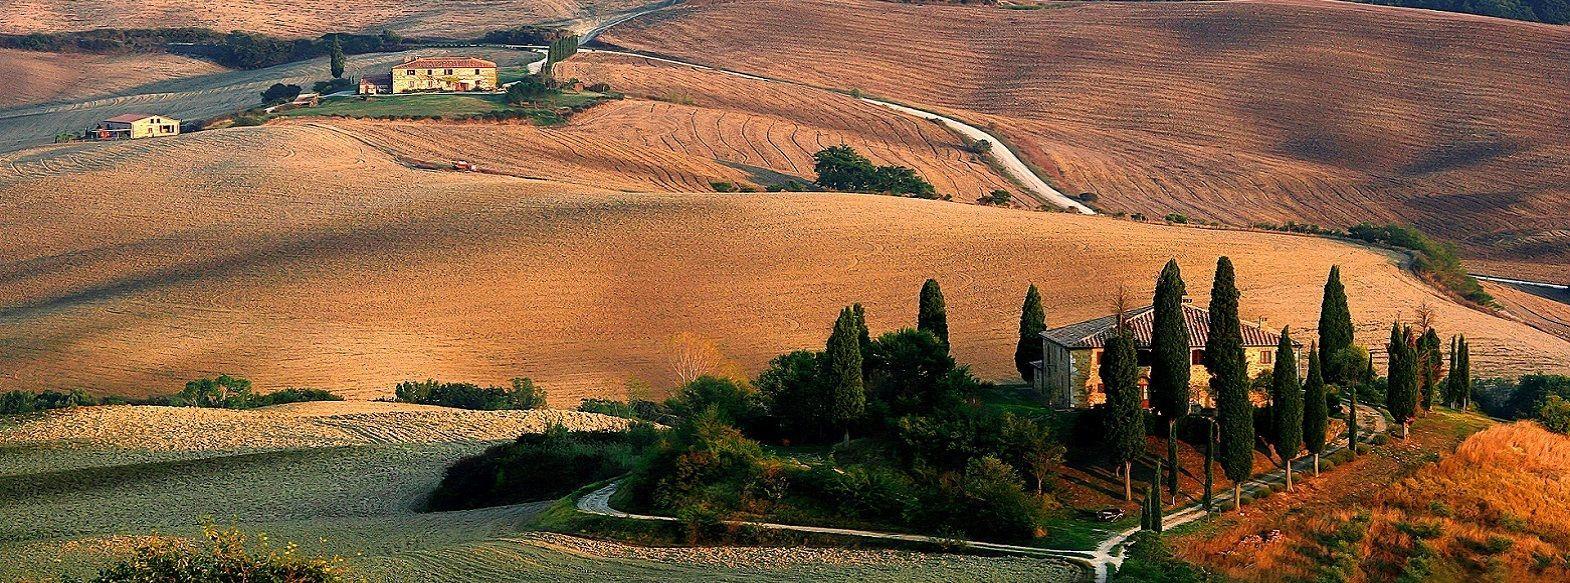 Happy in Tuscany - Chianti